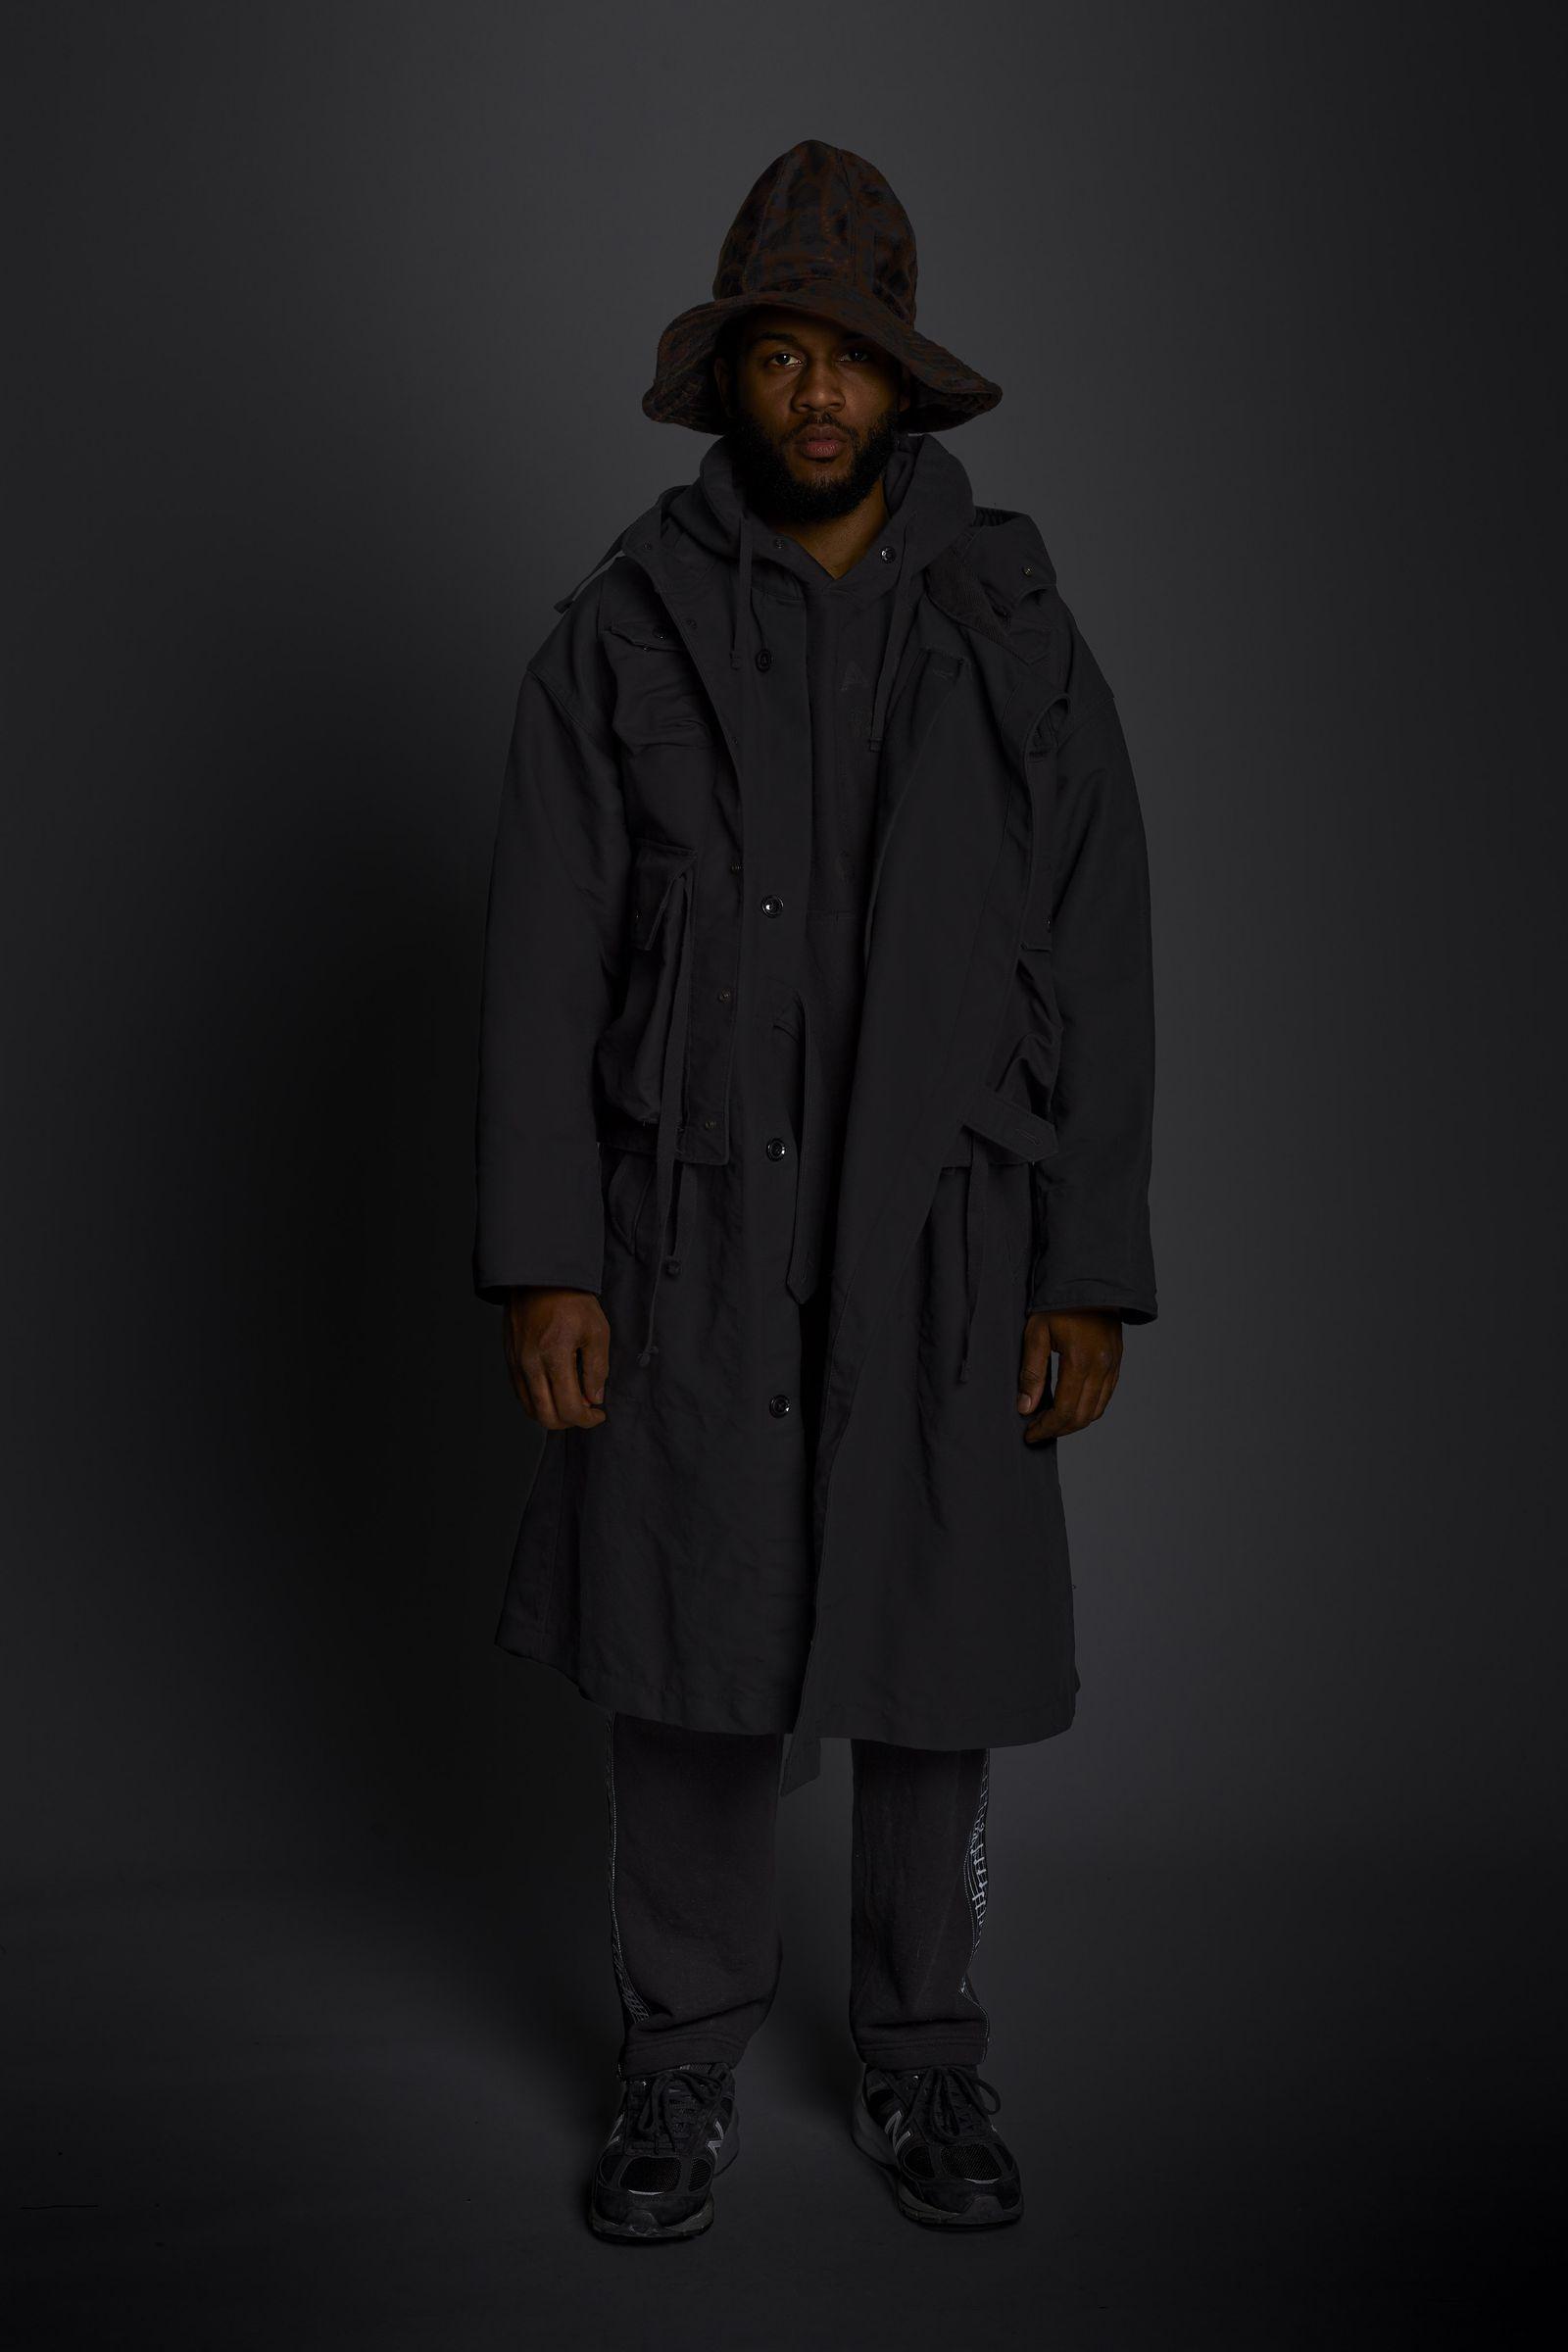 engineered-garments-fall-winter-2020-31